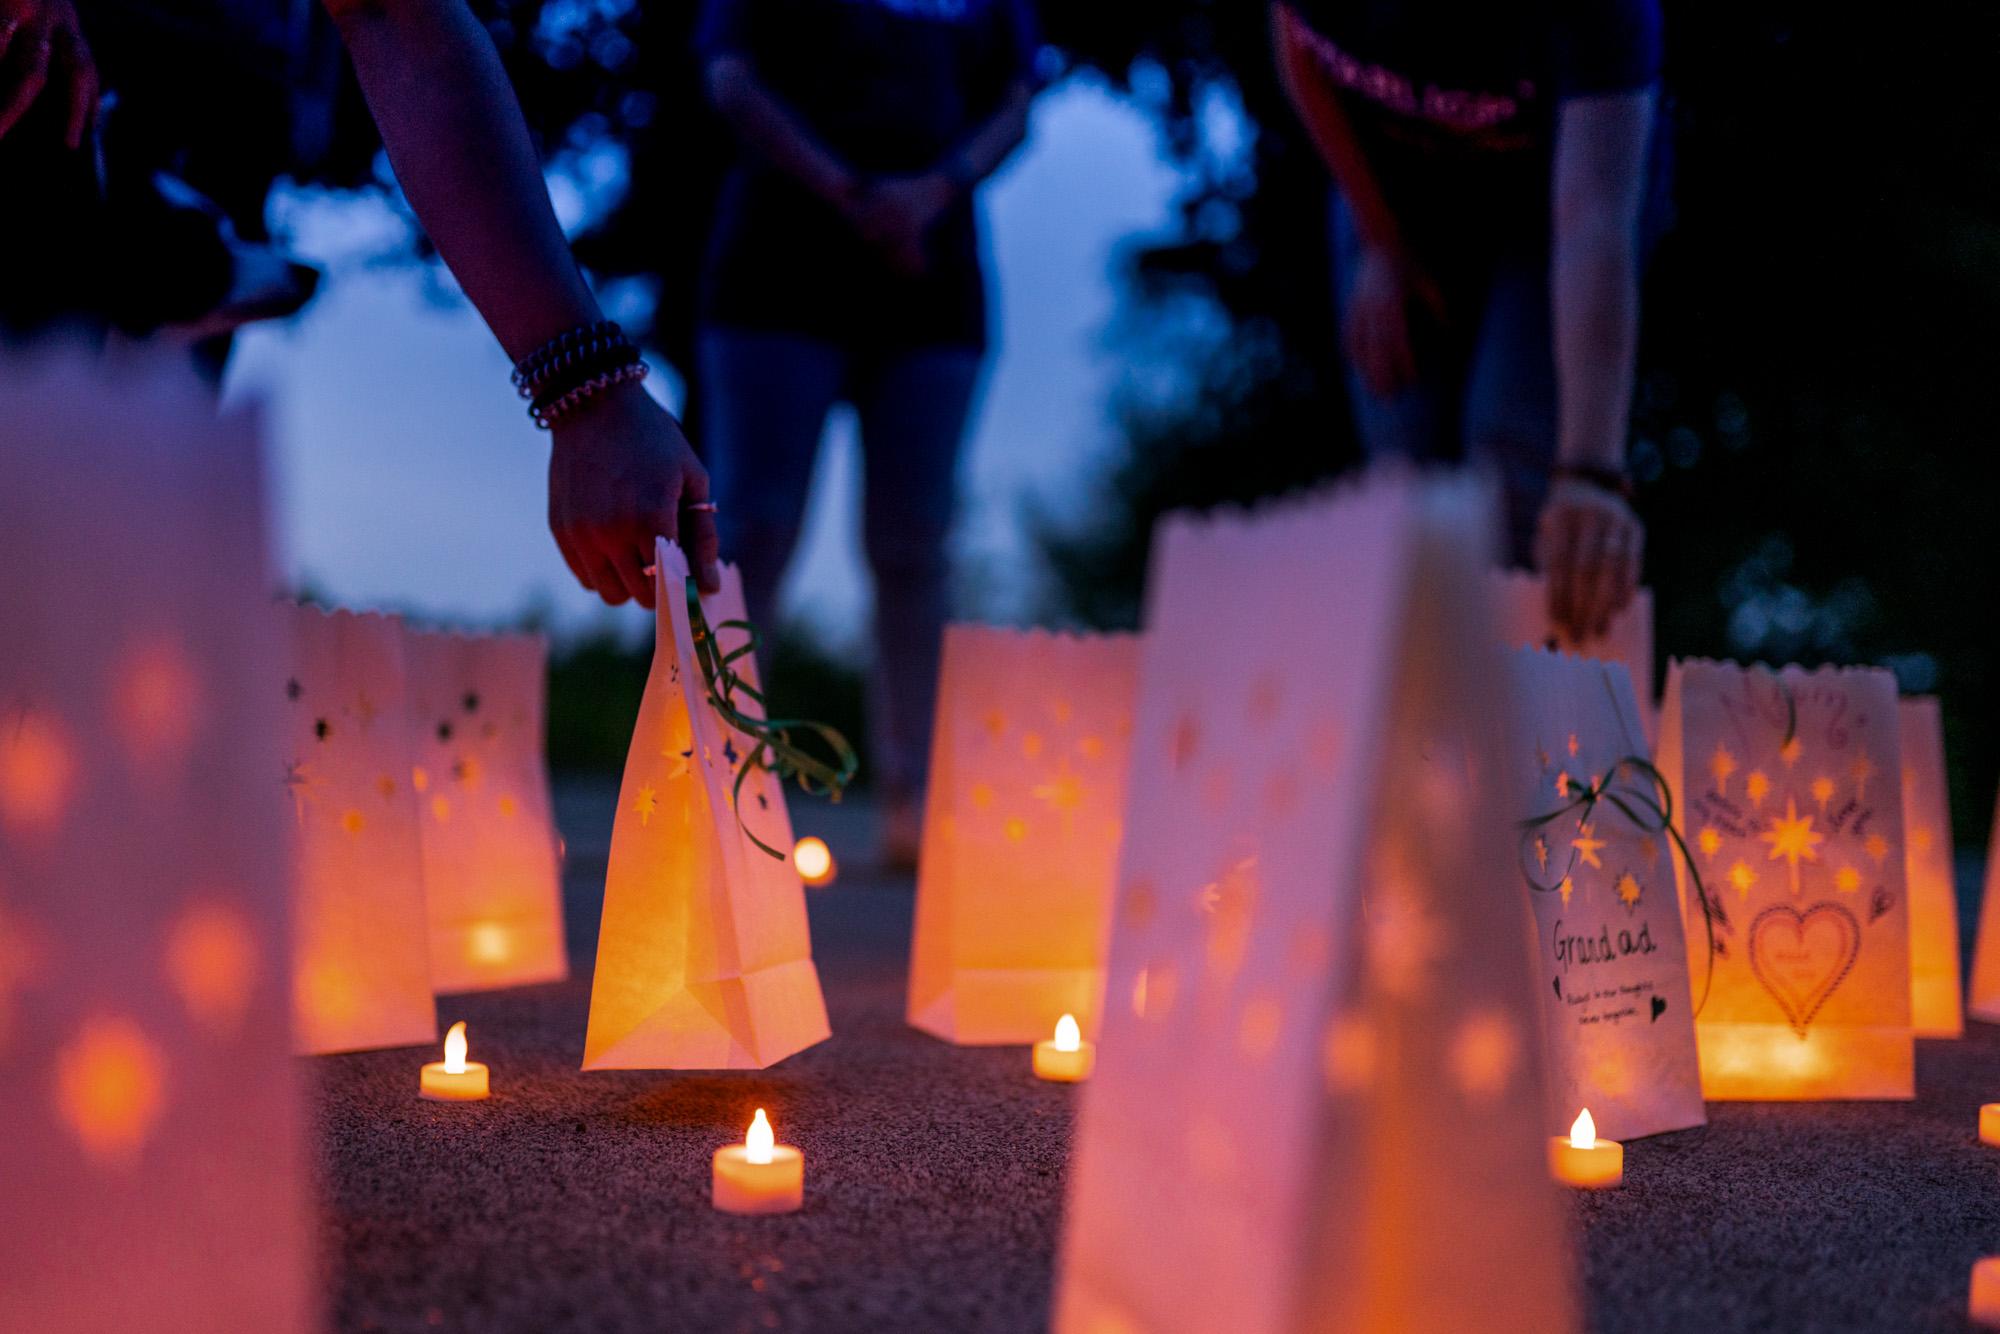 Starlight Stroll lanterns placed on the ground